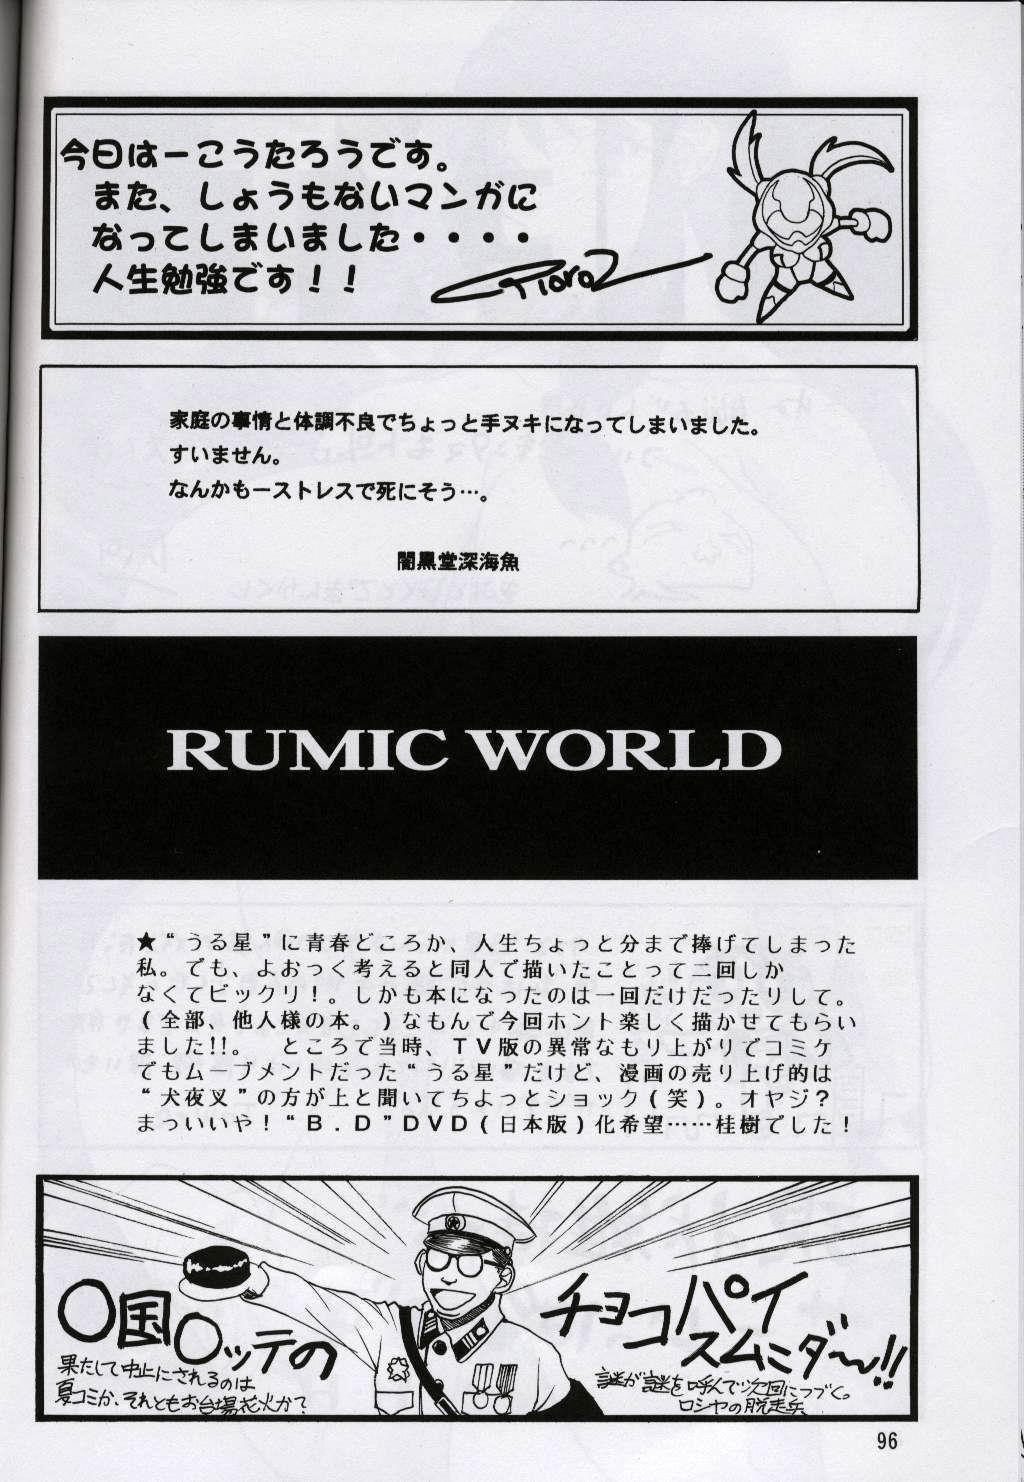 Next Climax Magazine 7 - Rumic World 94